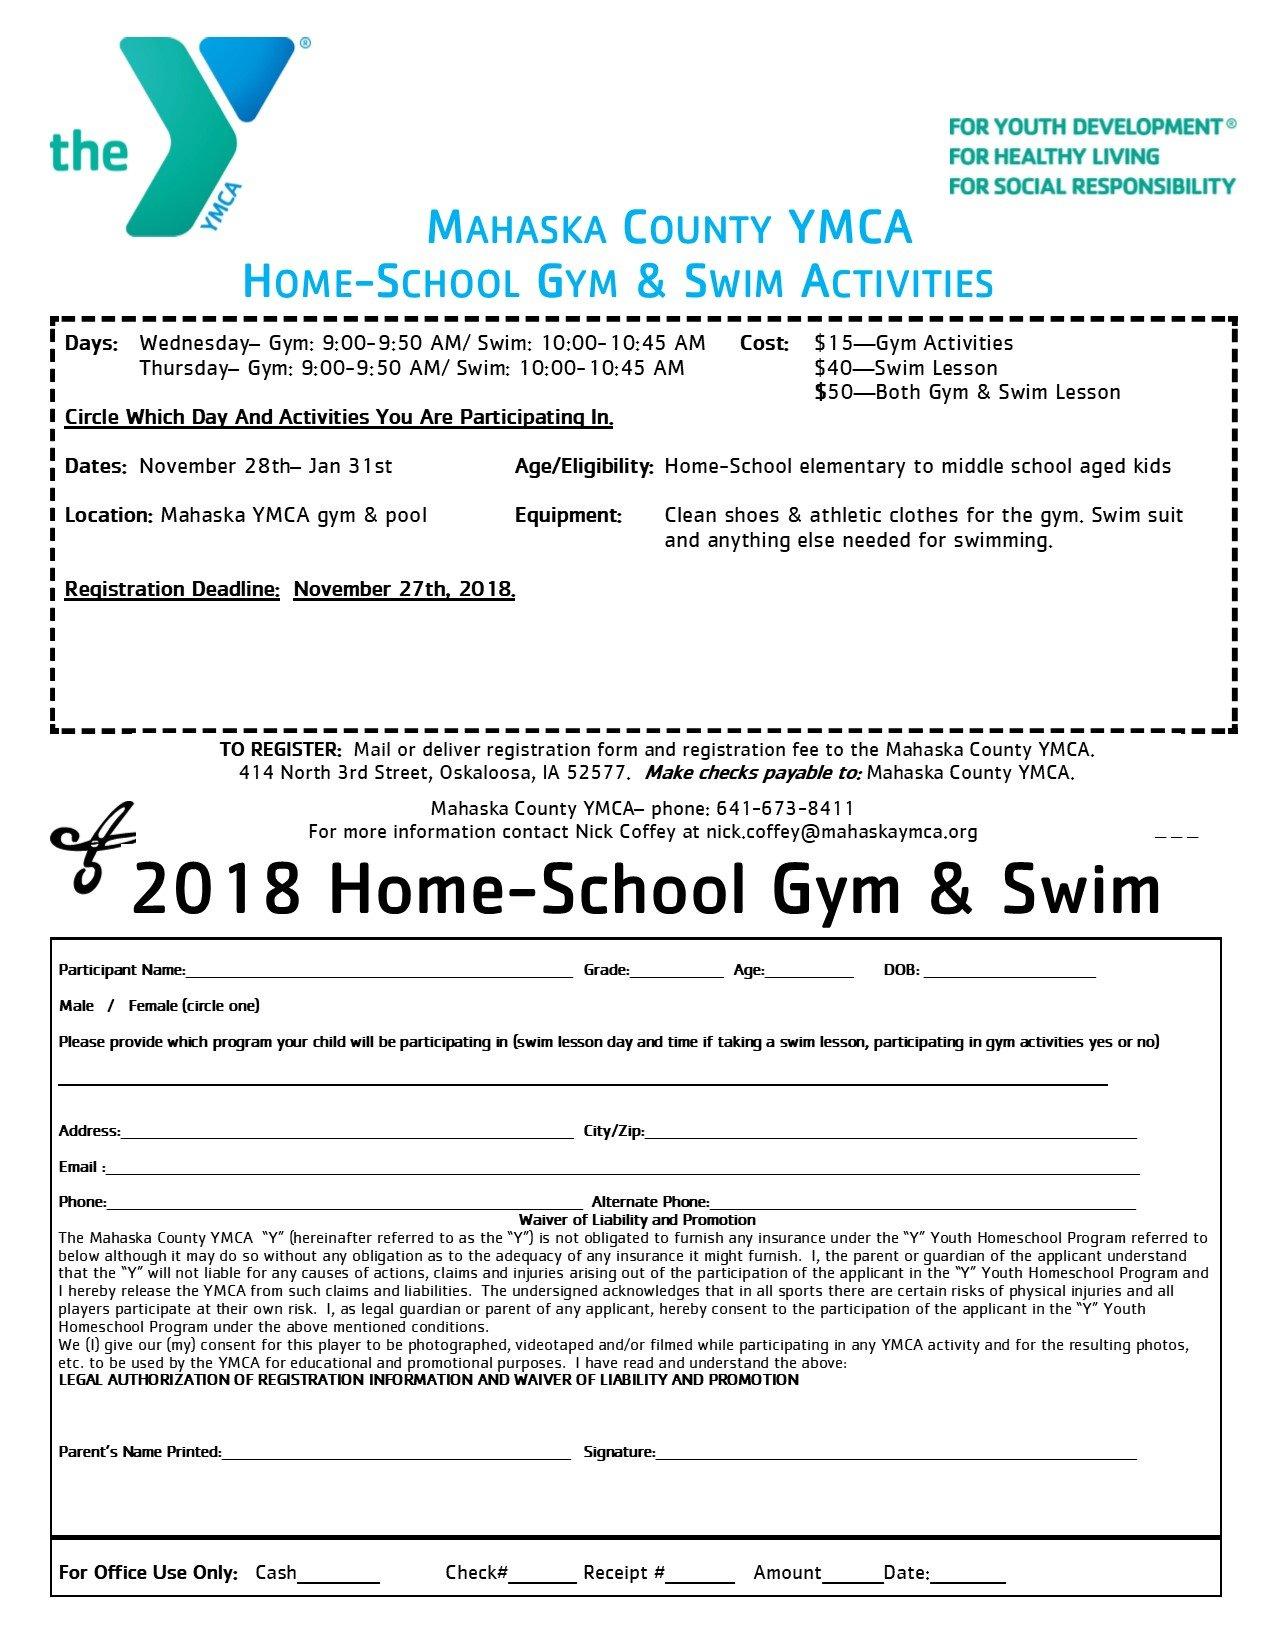 Home School Swim & Gym – Mahaska County YMCA